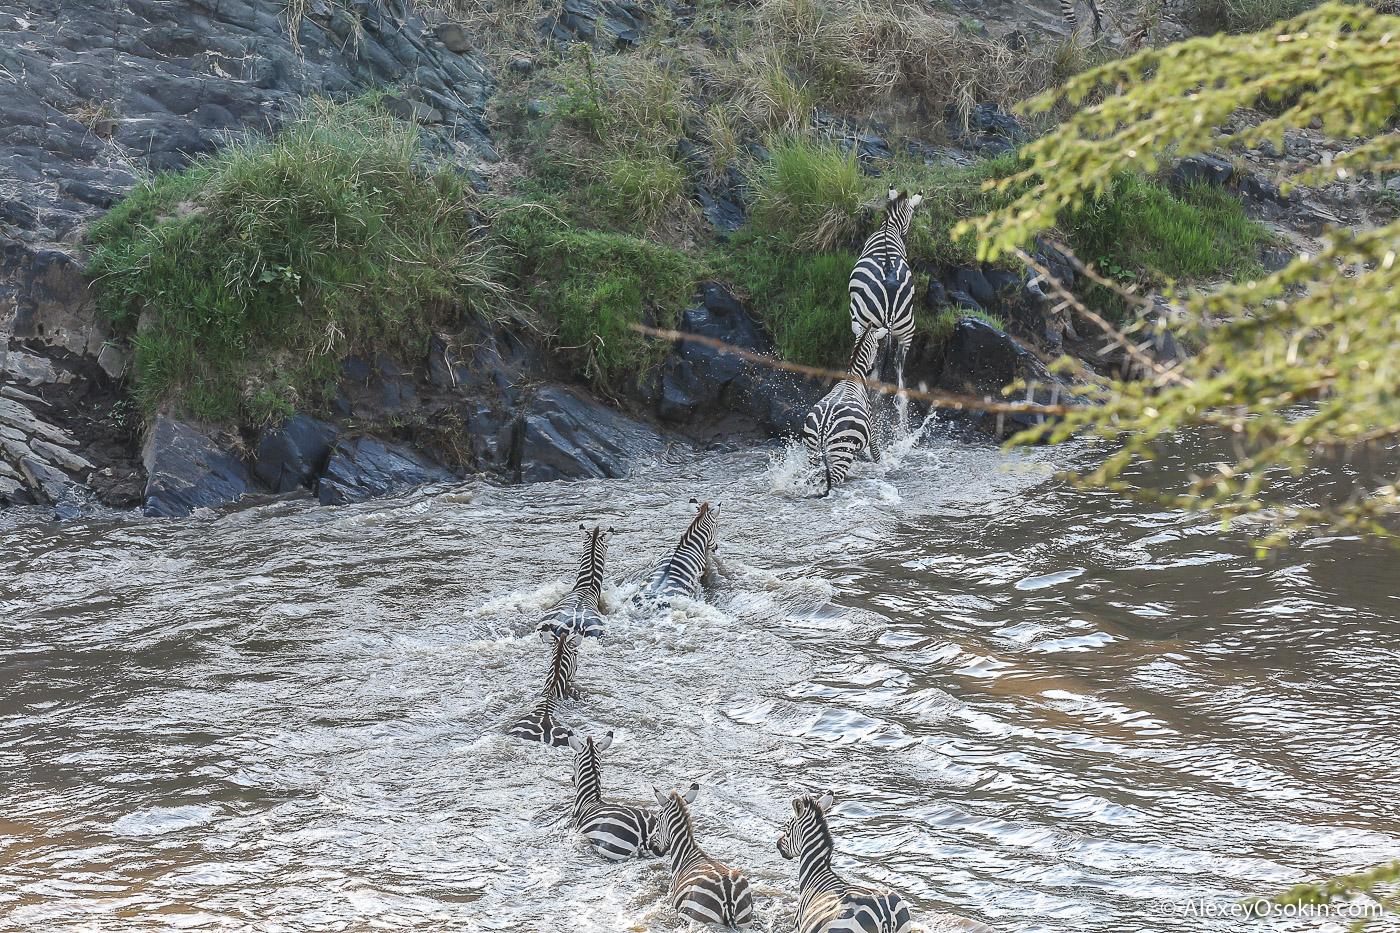 kenya-migration-ao, aug.2015.jpg